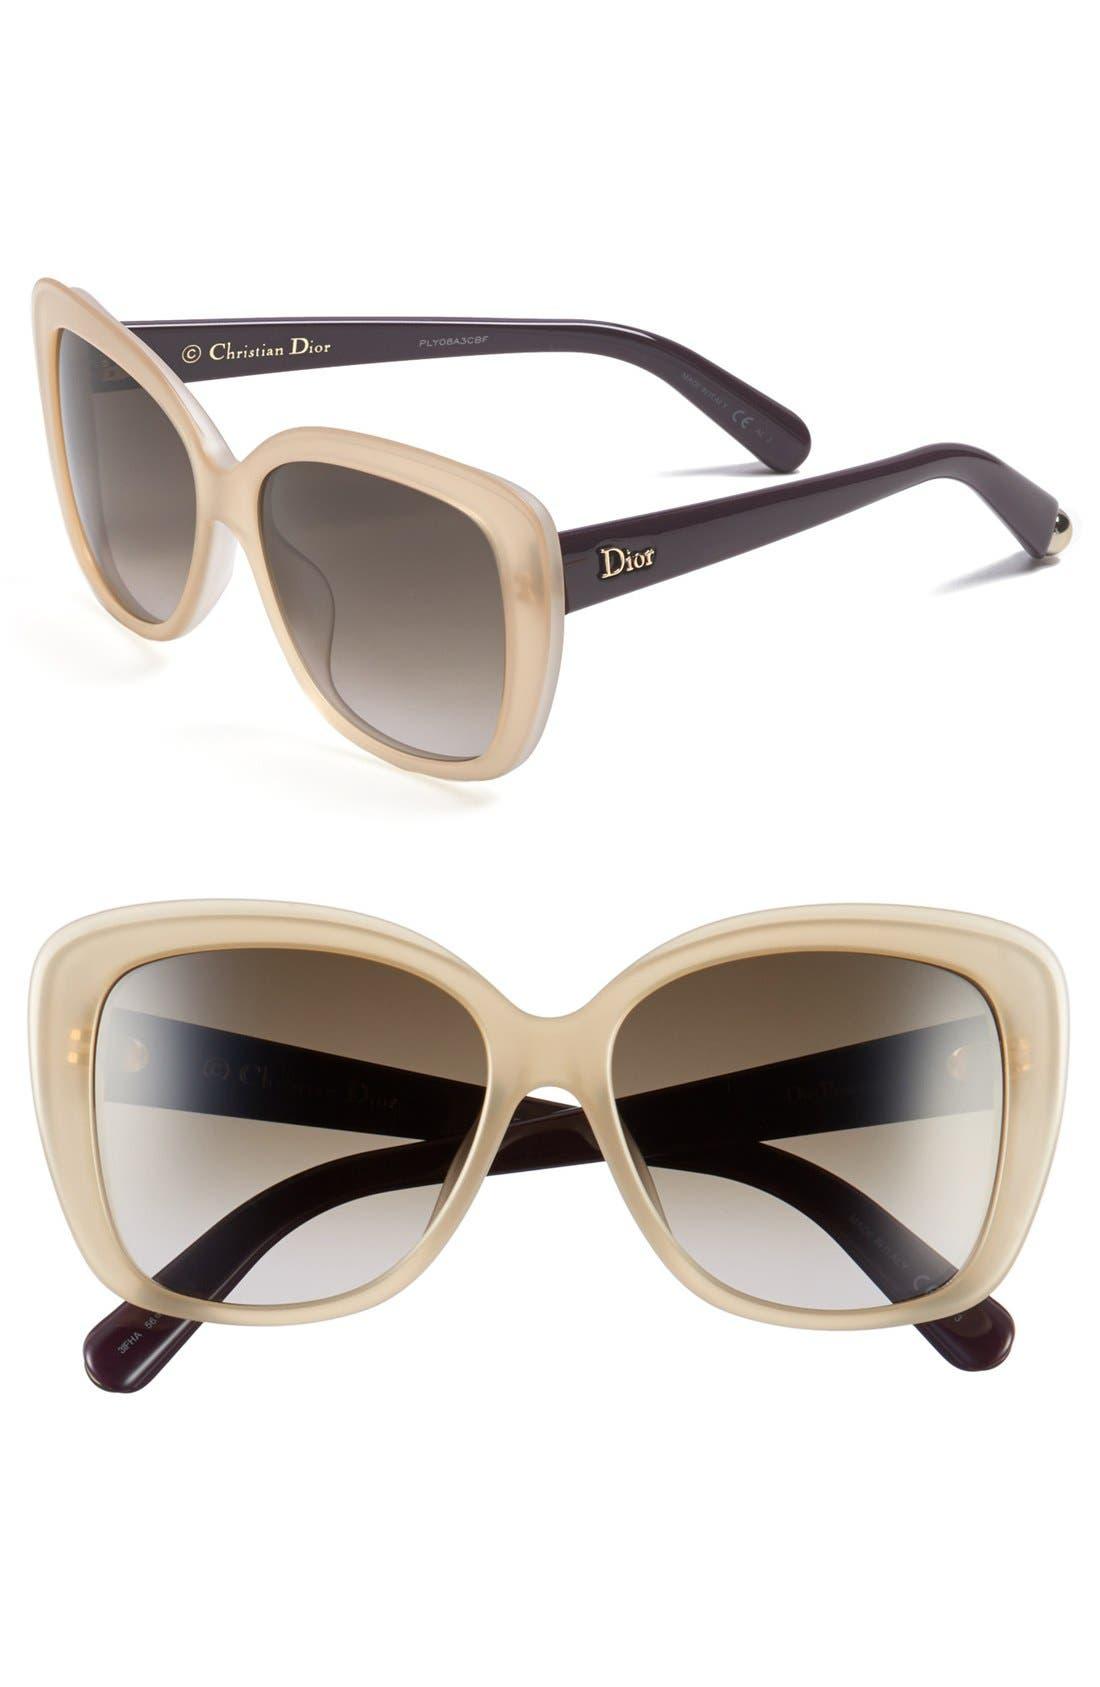 Main Image - Dior 'Promesse 2' 56mm Sunglasses